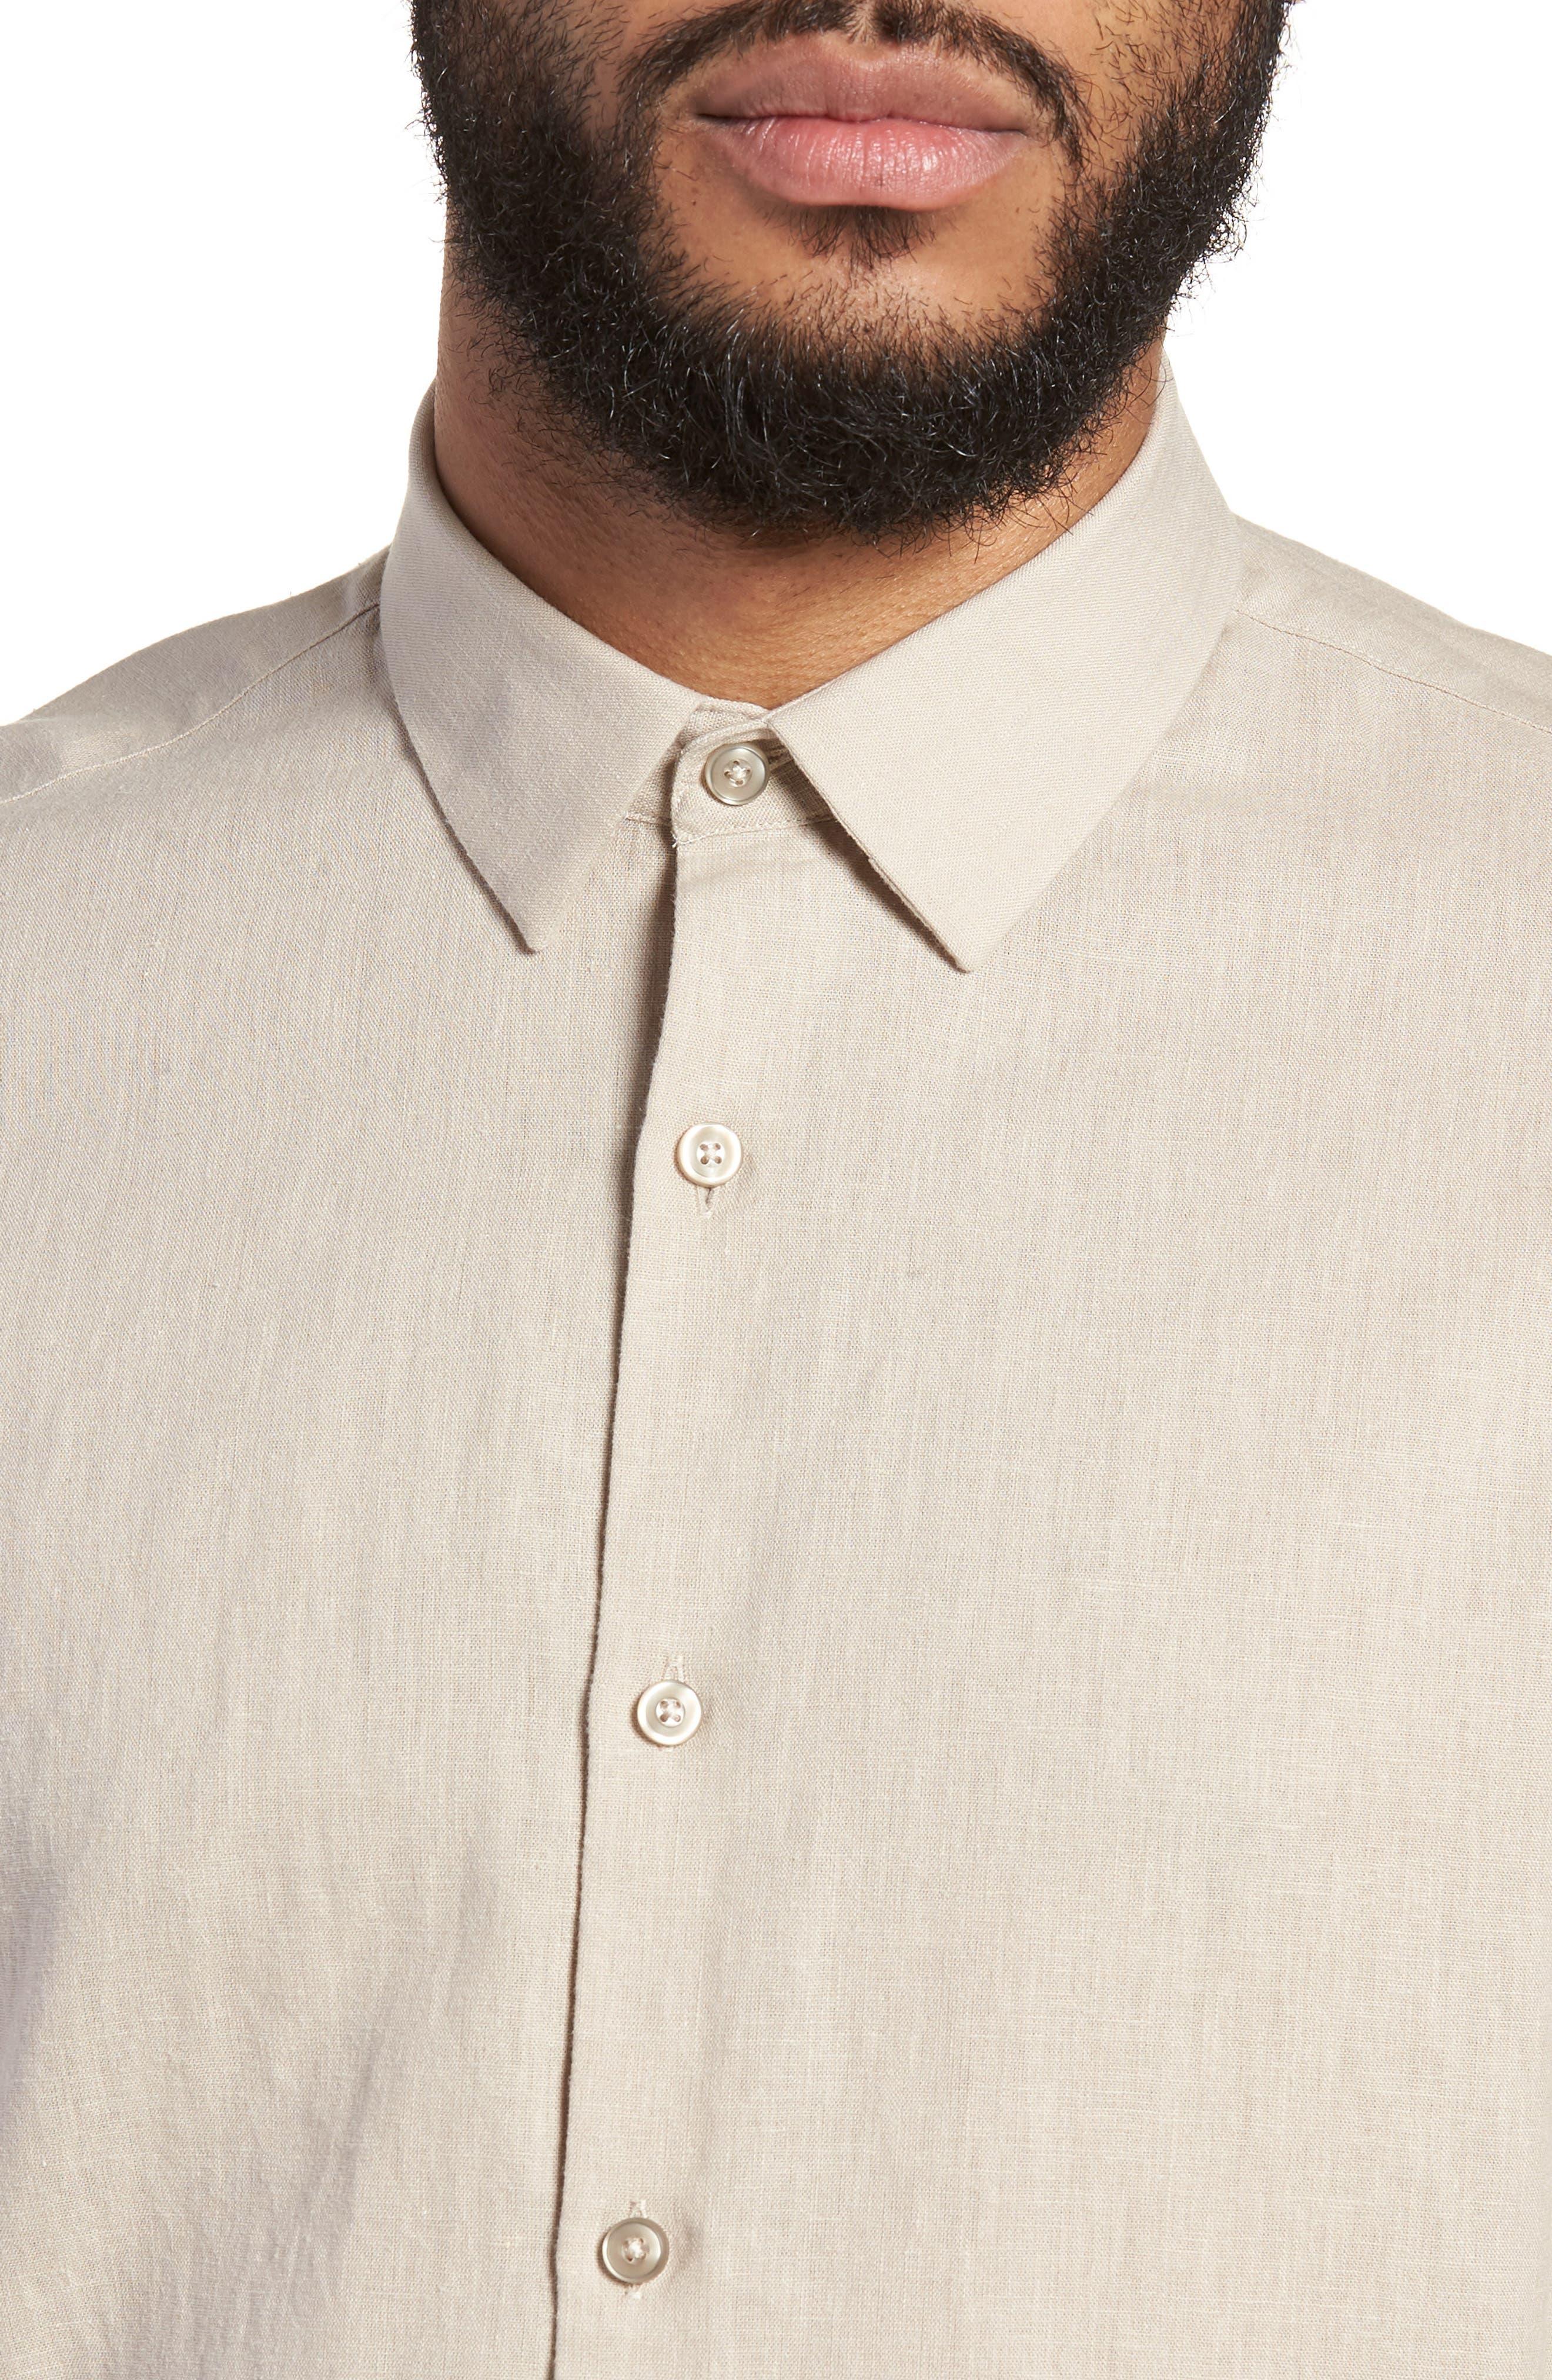 Linen Blend Sport Shirt,                             Alternate thumbnail 2, color,                             Beige Bliss